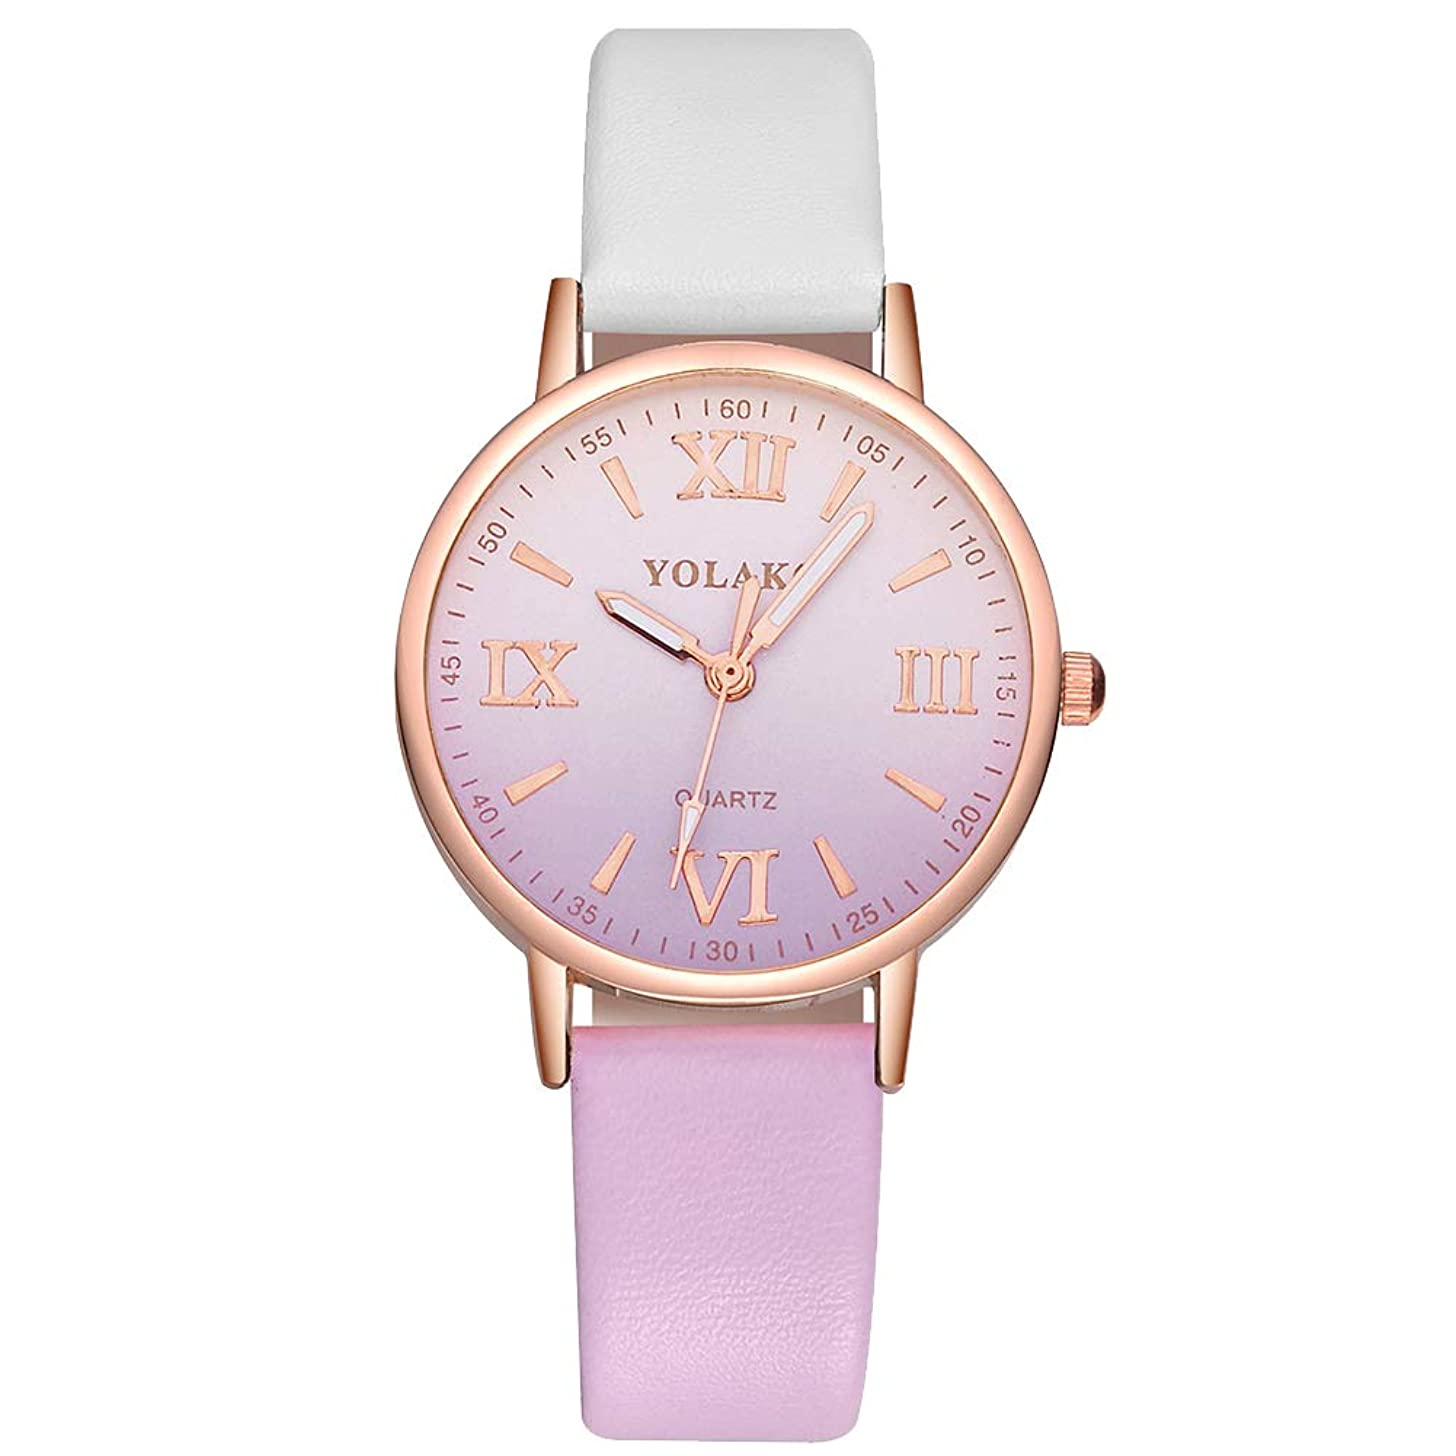 lightclub Women Roman Numbers Color Block Dial Faux Leather Band Analog Quartz Watch Gift for Women Men Purple